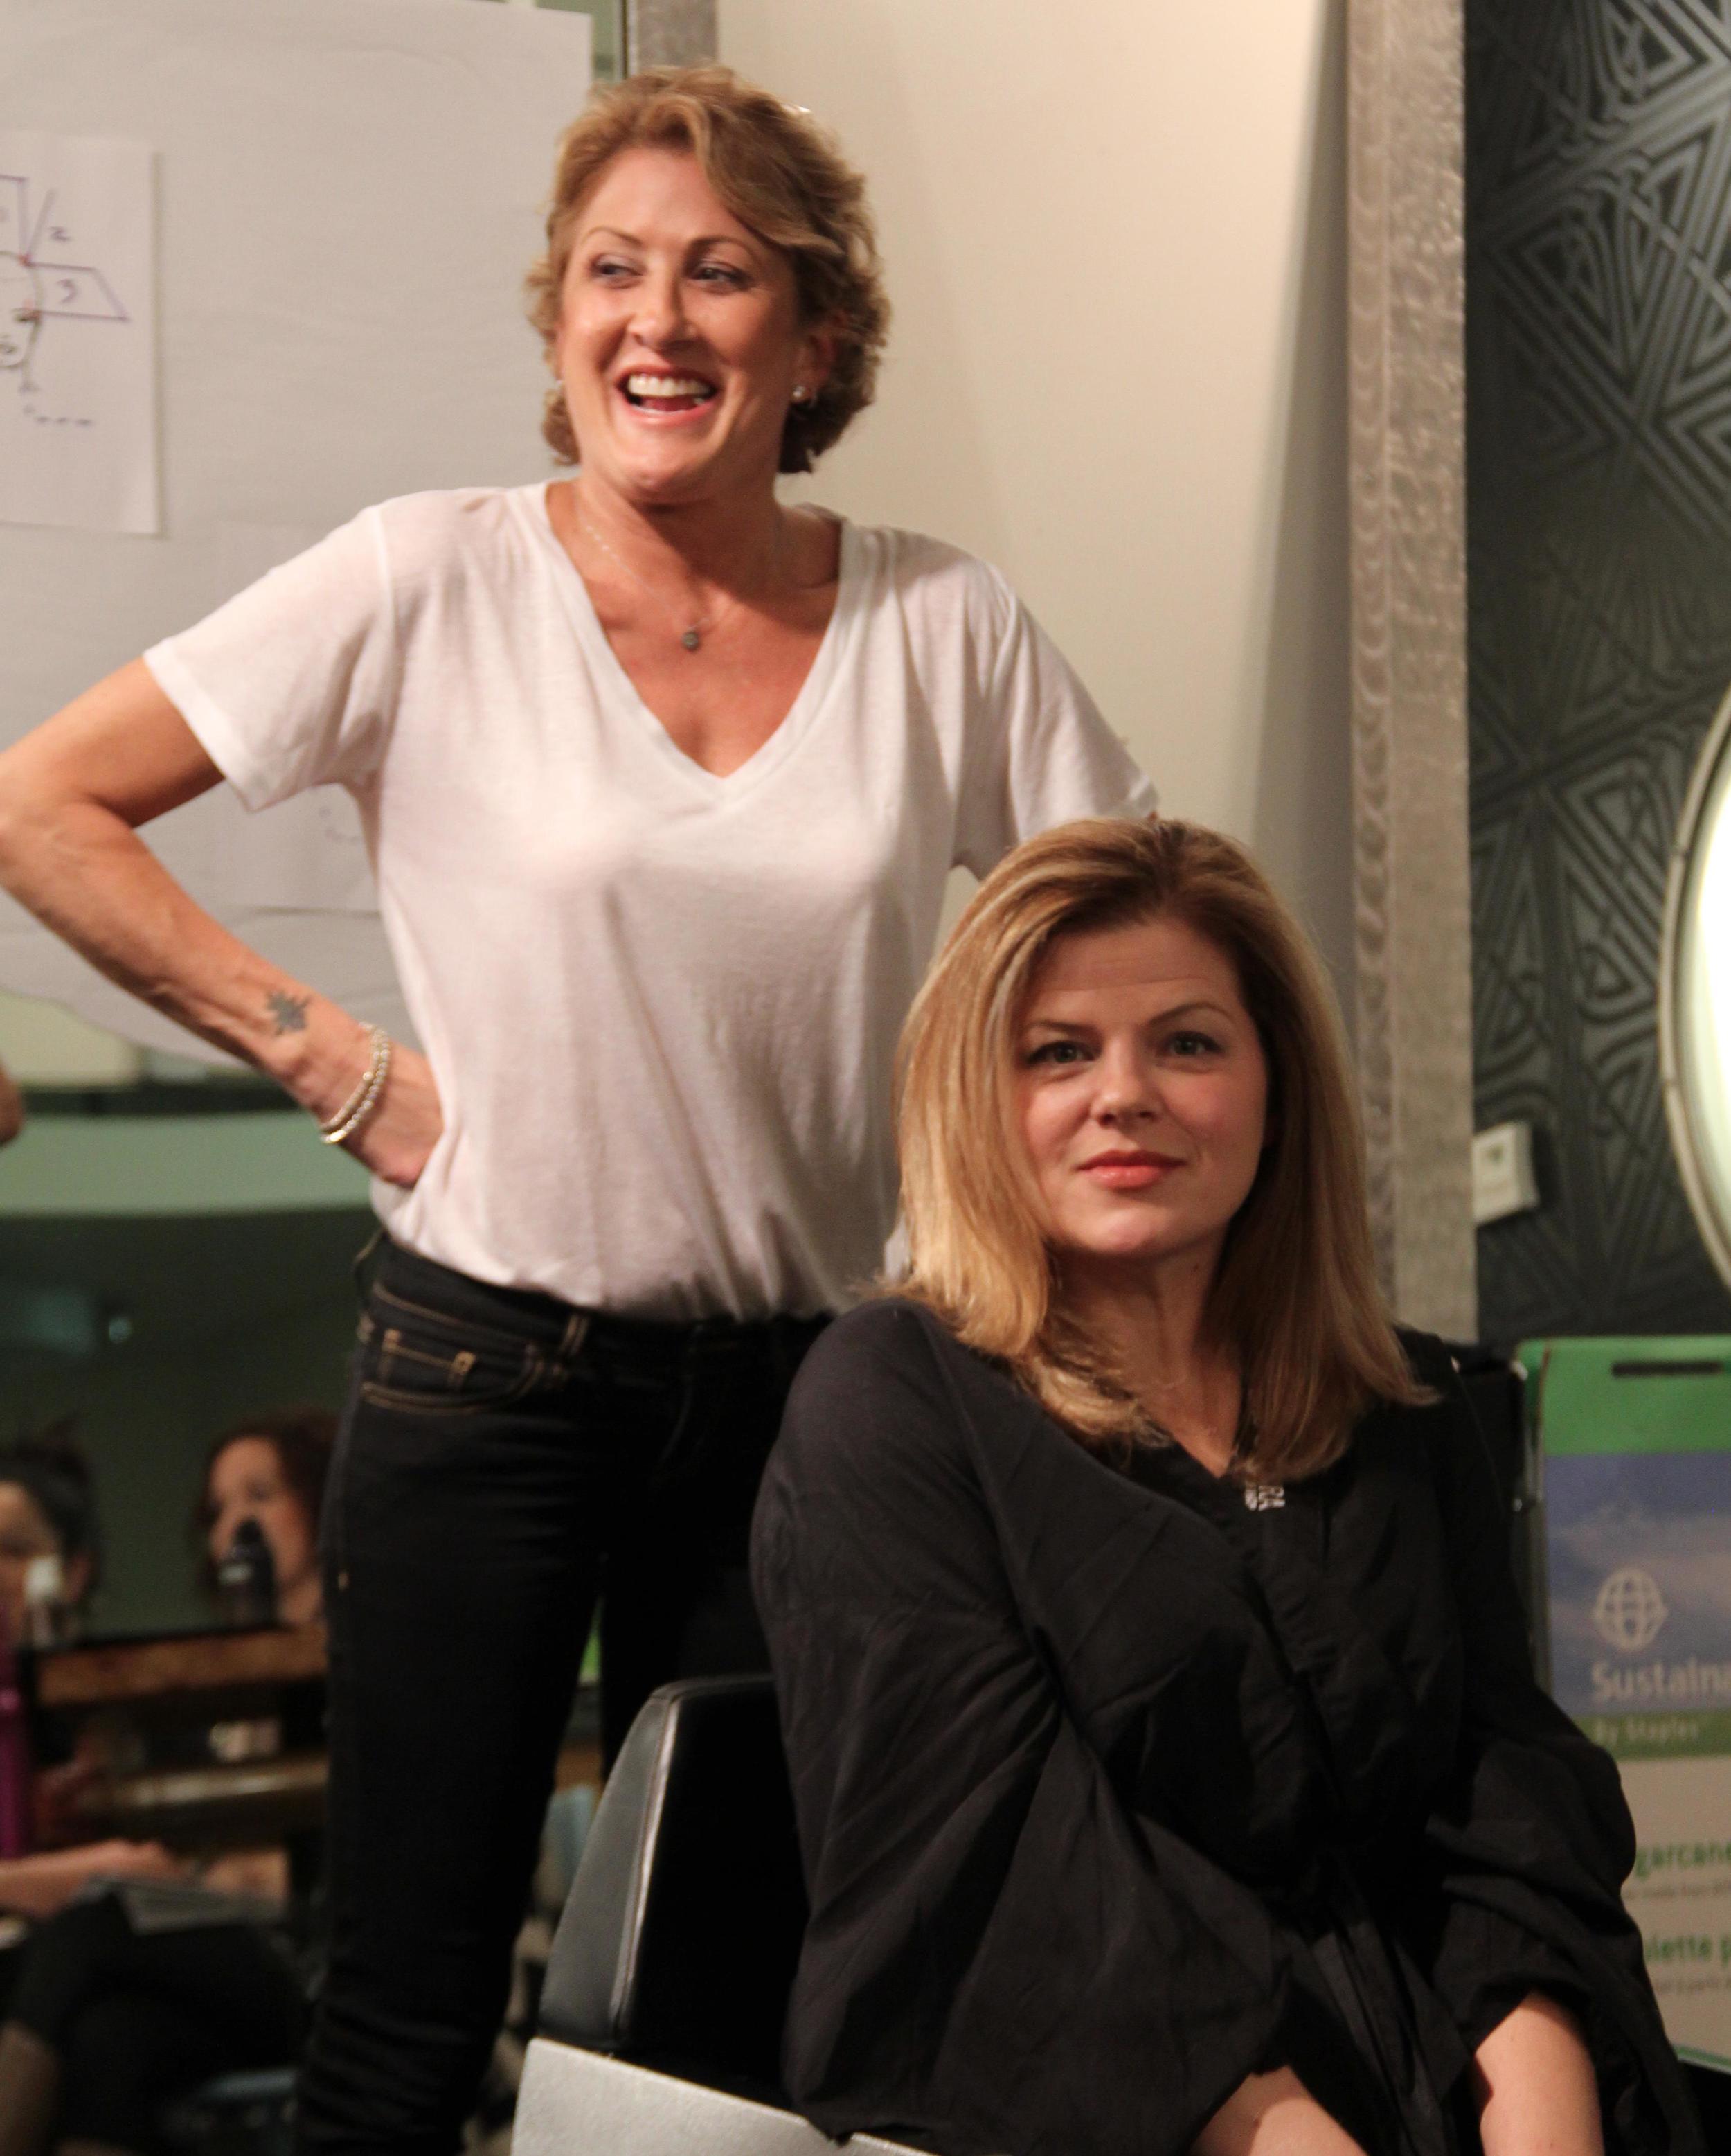 Linda Francipane of NYC teaches class for Umbrella Salon, San Jose, CA and Buzz Salon, Iowa City, IA. Model, Erin Connolly